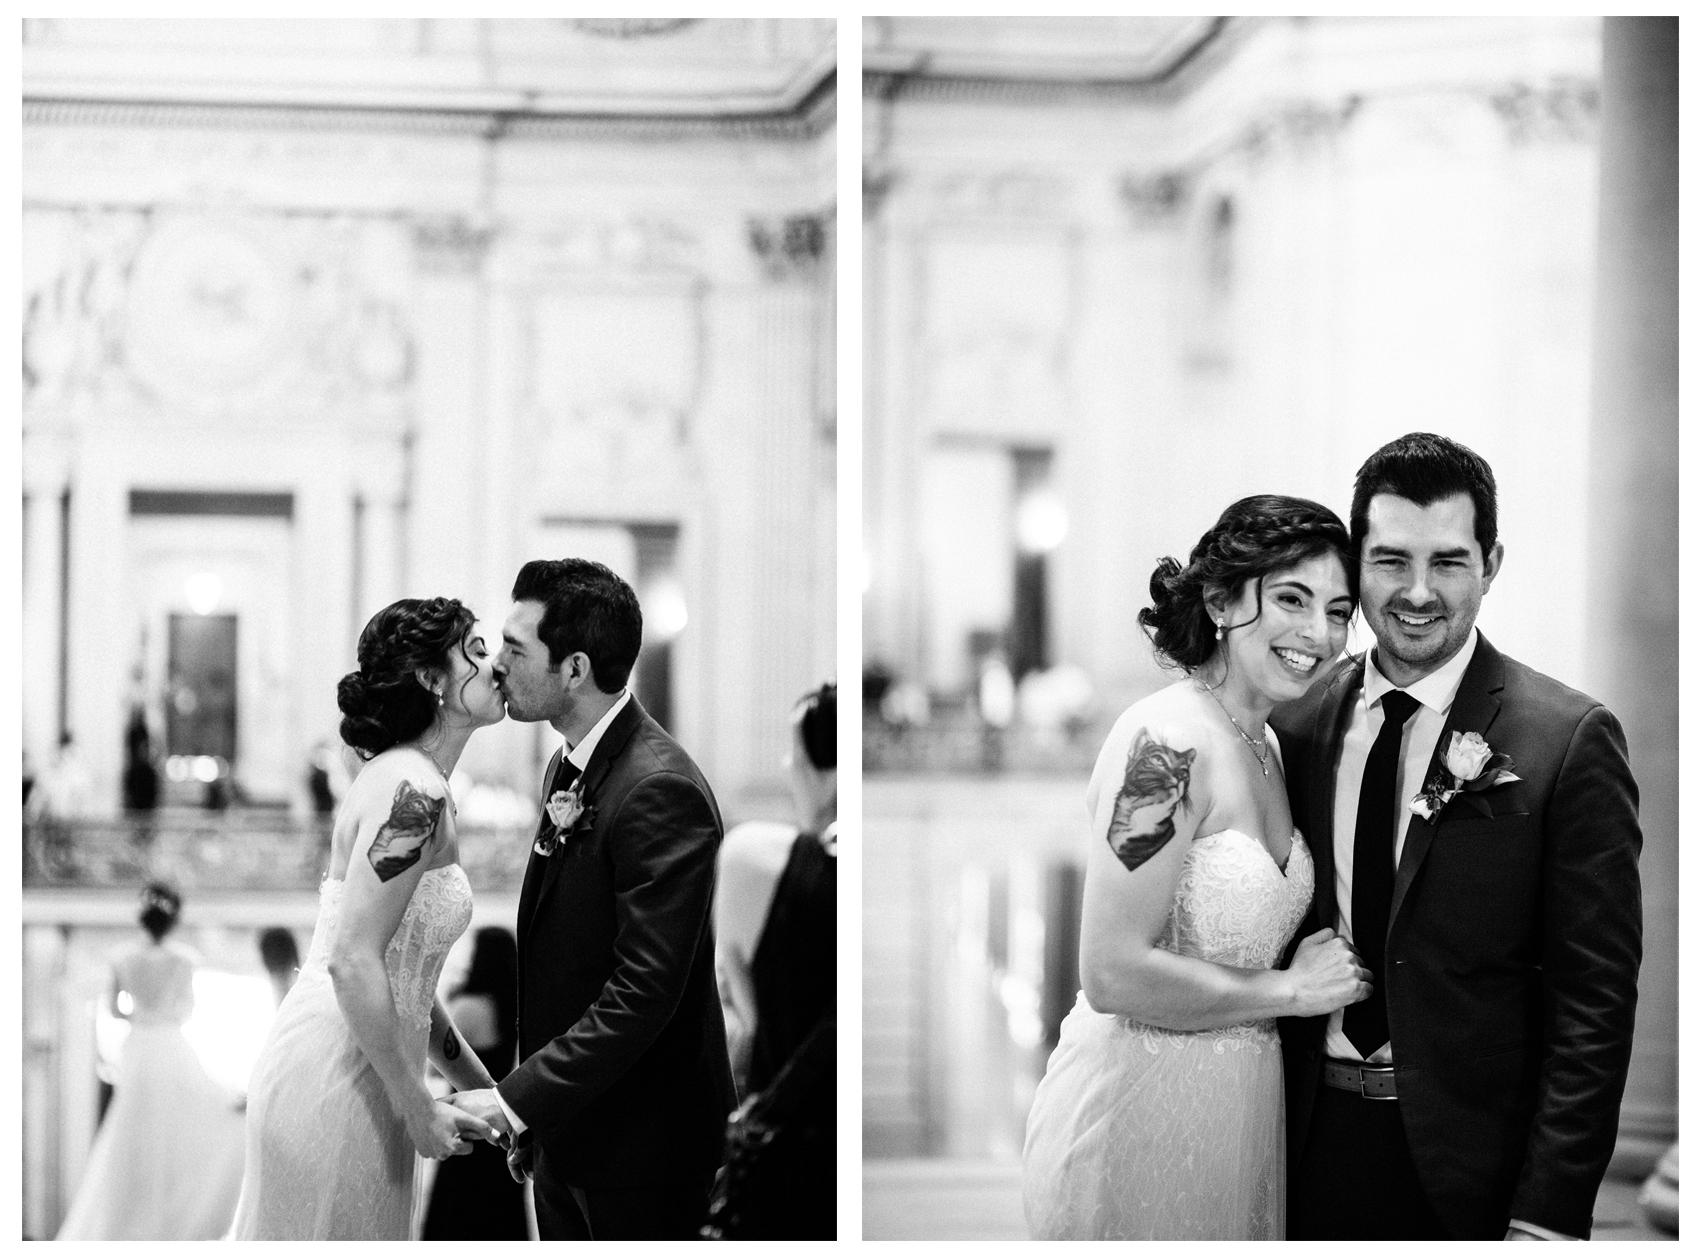 San Francisco City Hall & Stable Cafe Wedding Photography Double 5.jpg